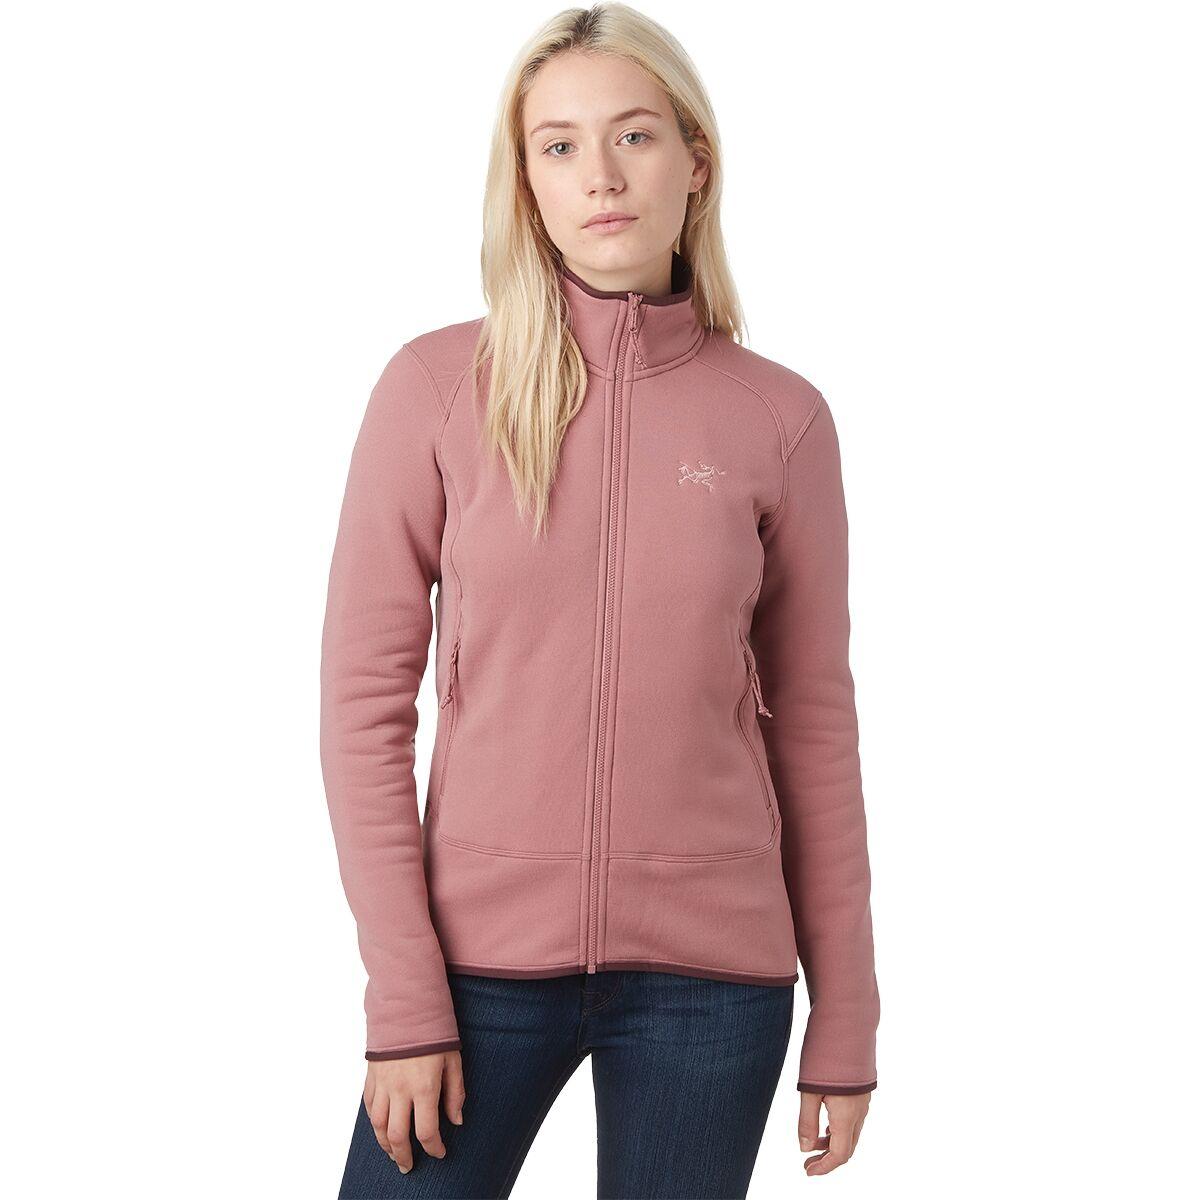 Kyanite Fleece Jacket - Women